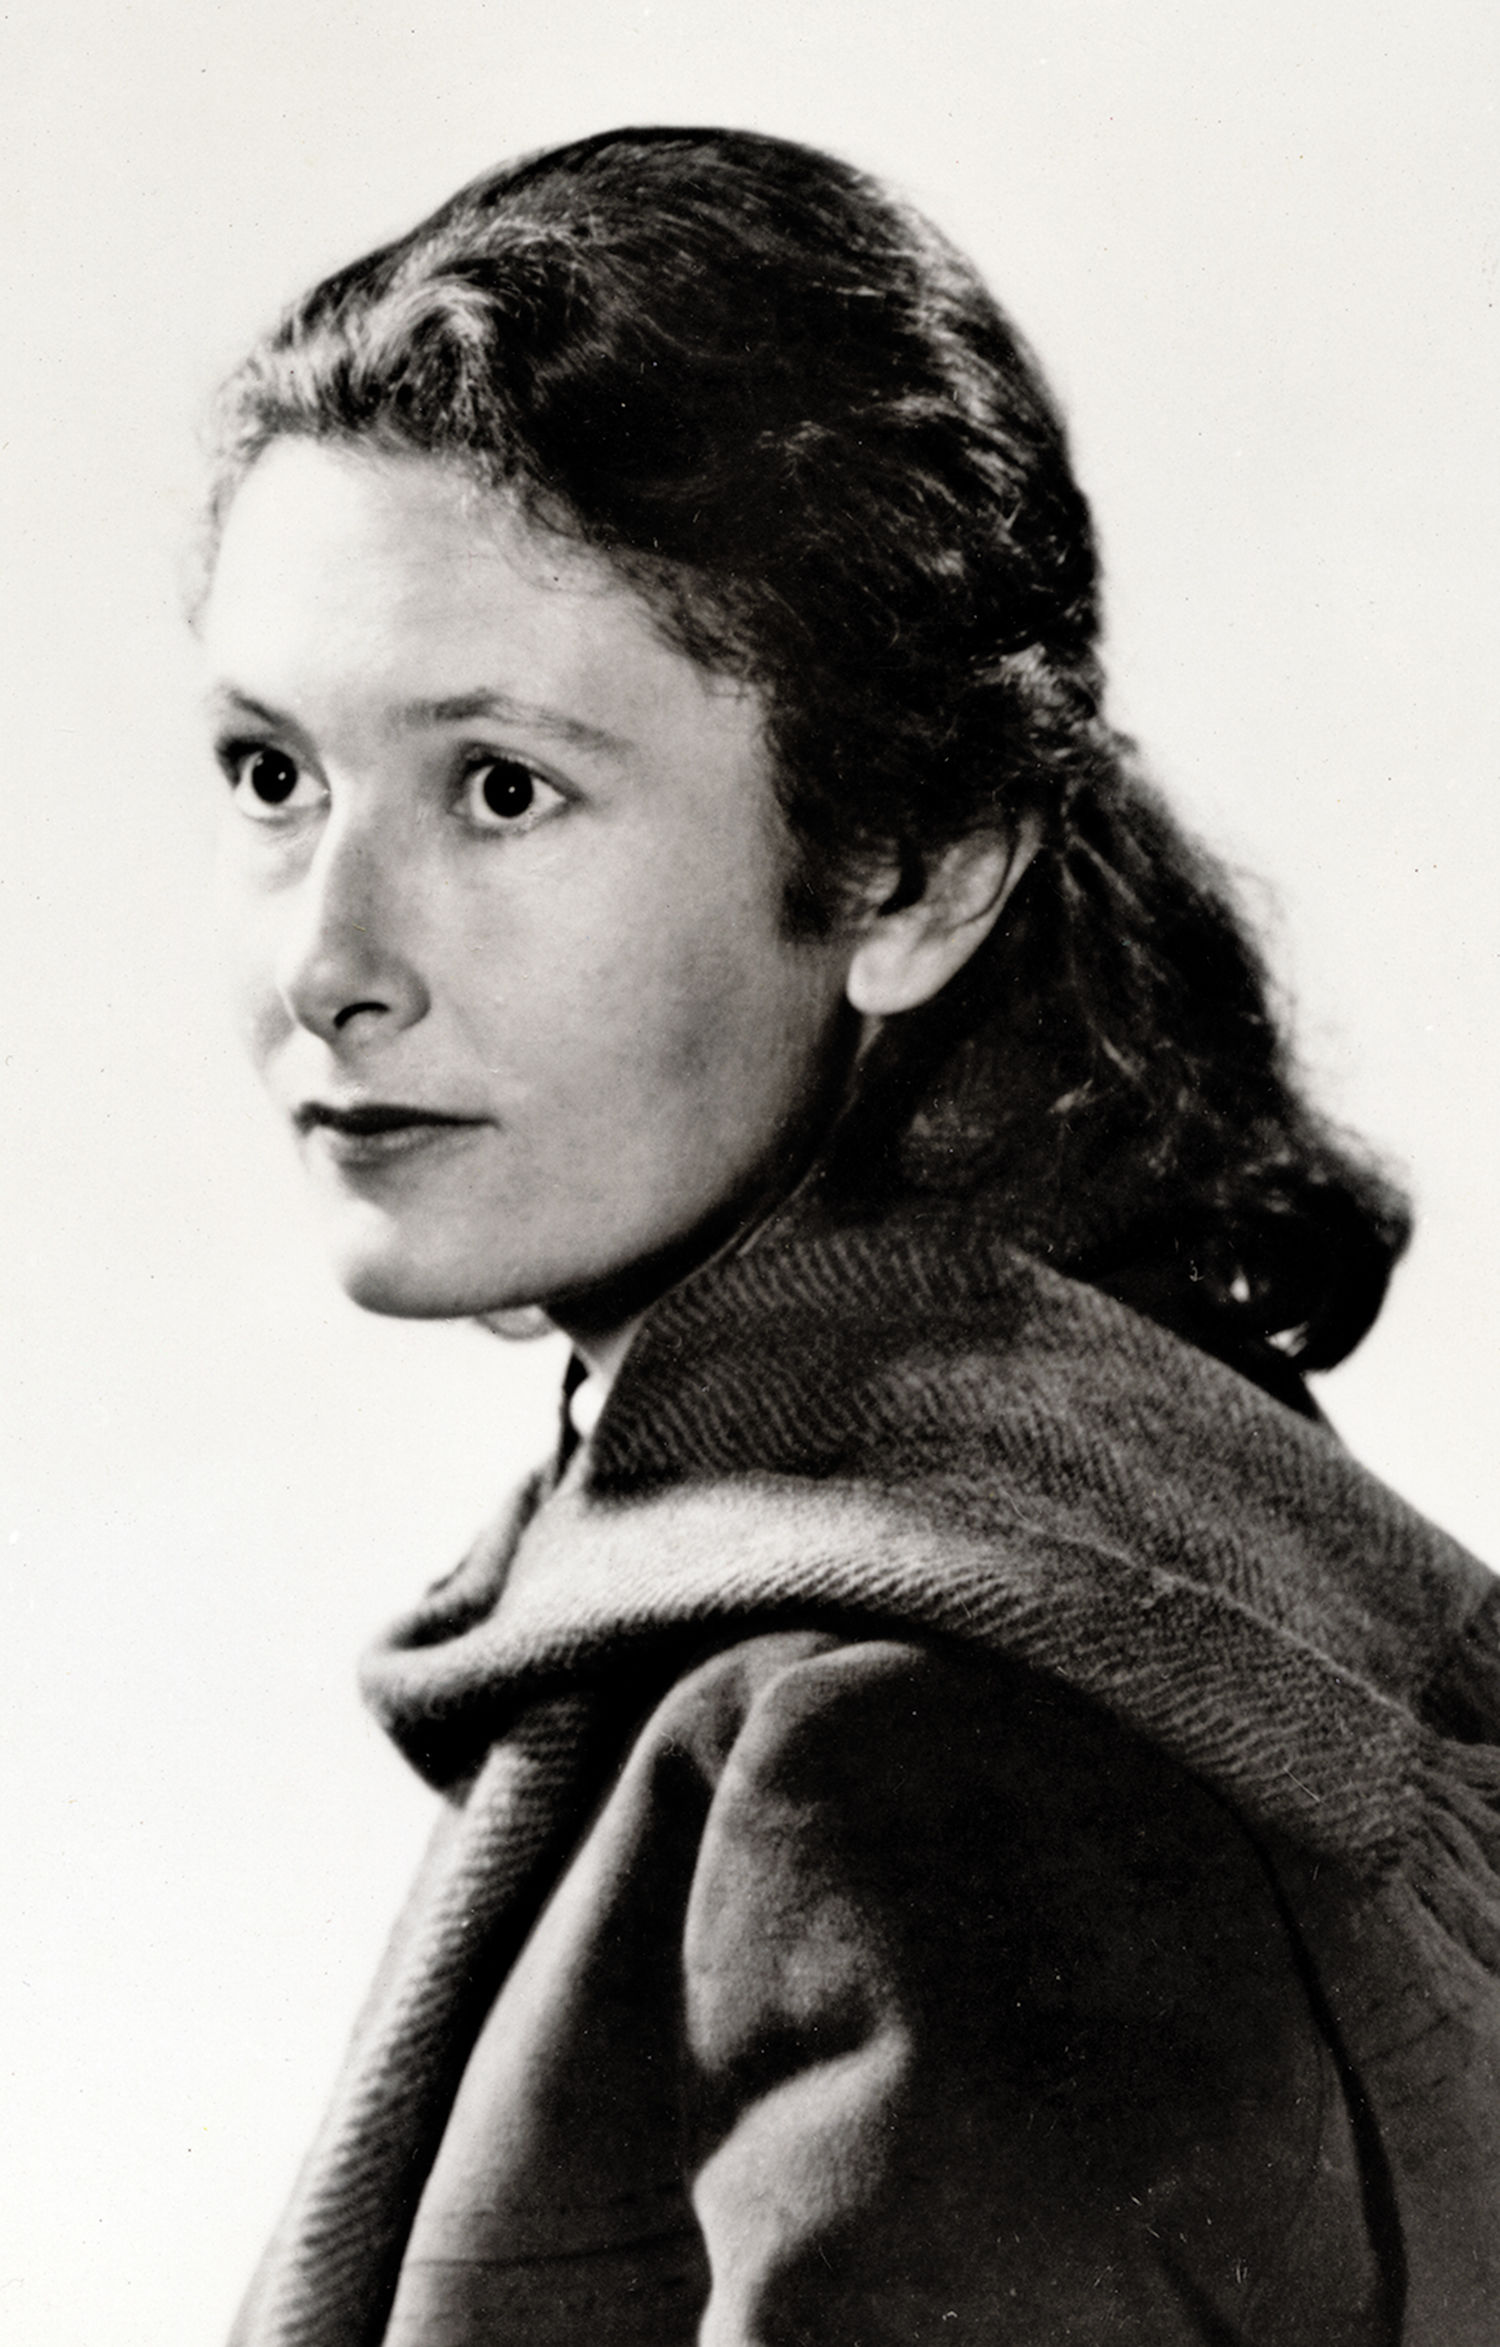 Mary Hignett